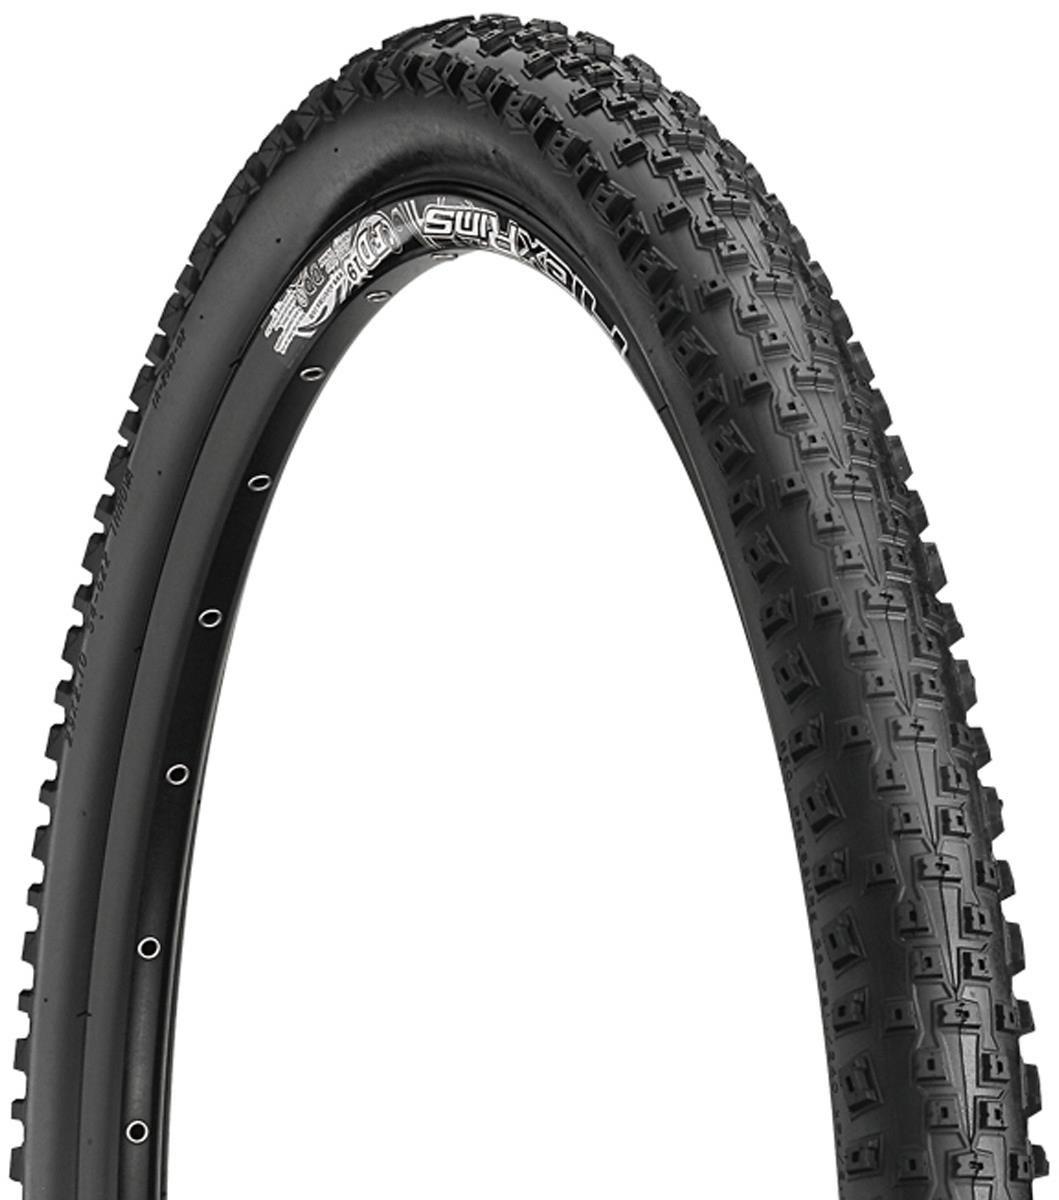 Nutrak Blockhead 27.5 inch 60 tpi Dual Compound Kevlar Bead Tyre | Tyres